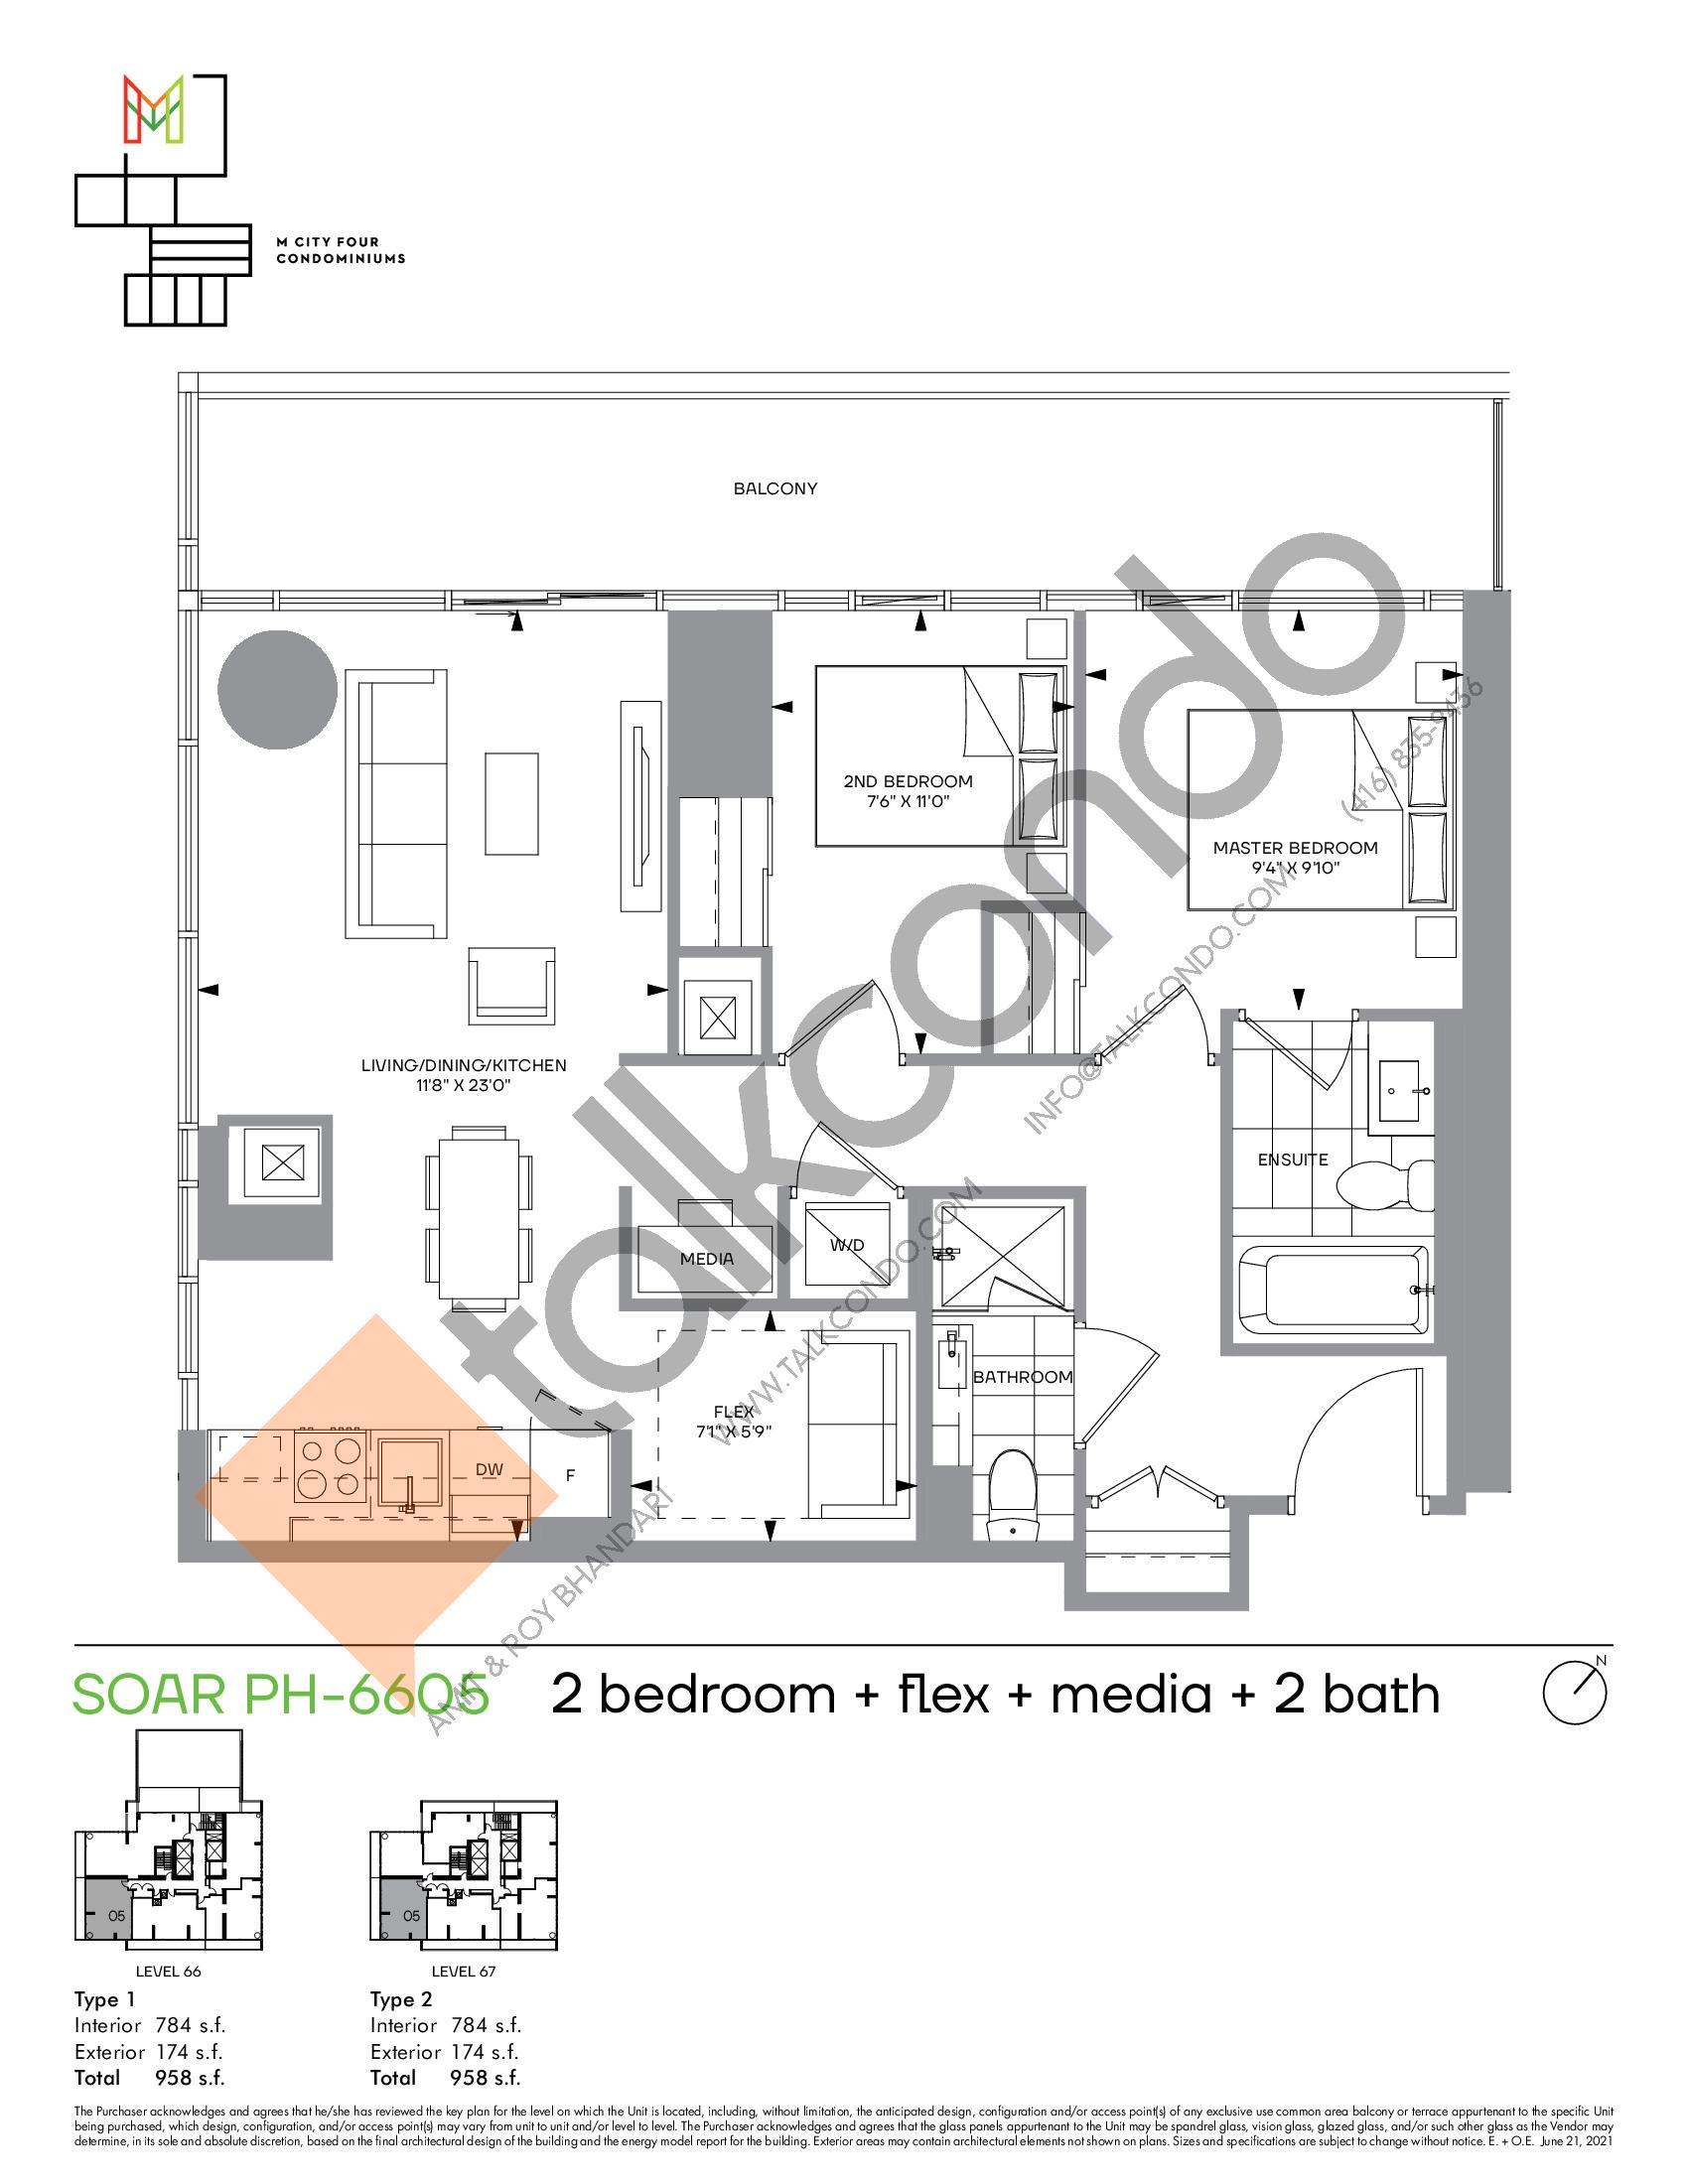 Soar PH-6605 Floor Plan at M4 Condos - 784 sq.ft